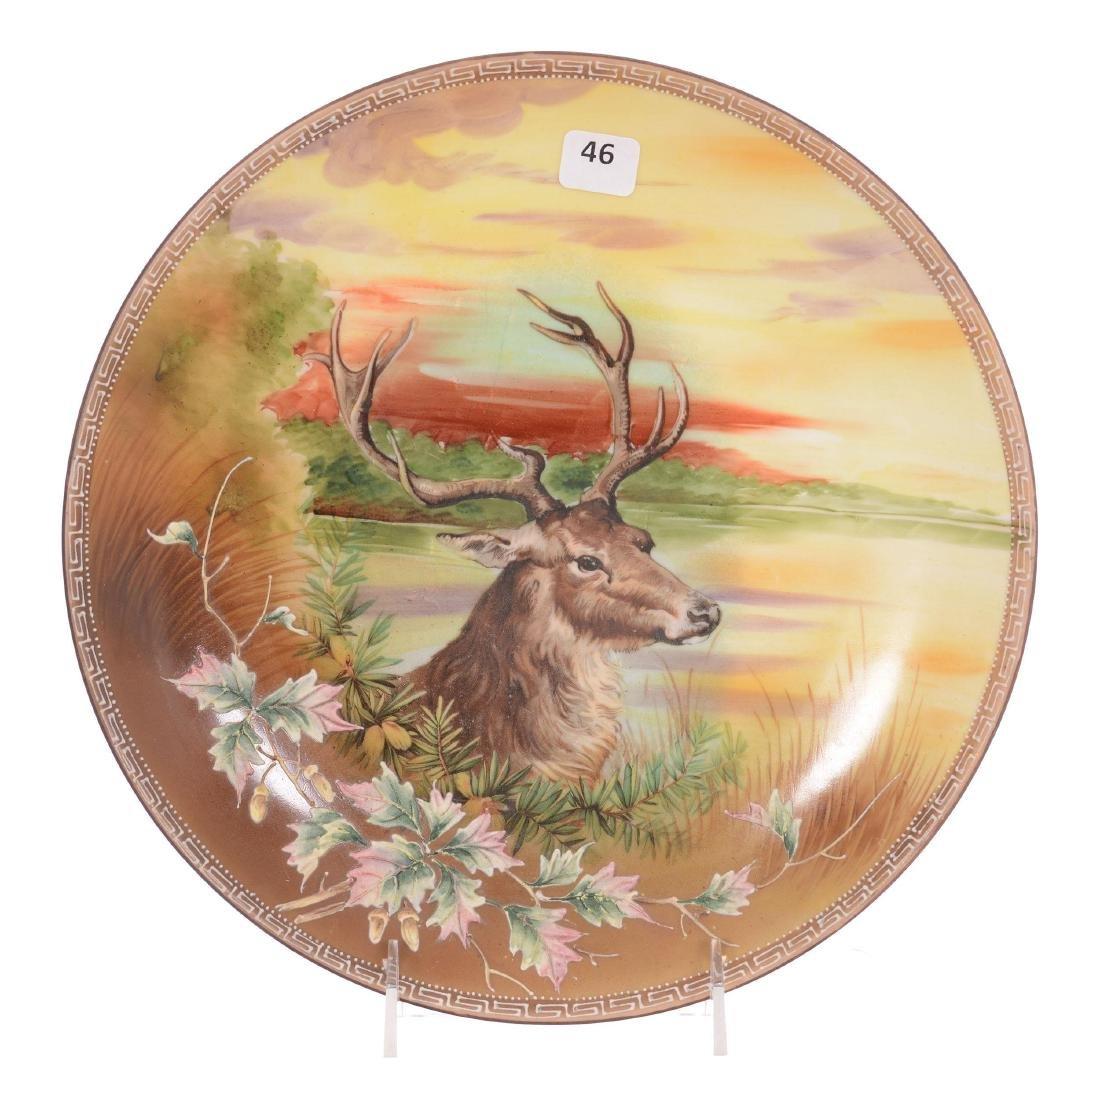 Nippon Round Plaque